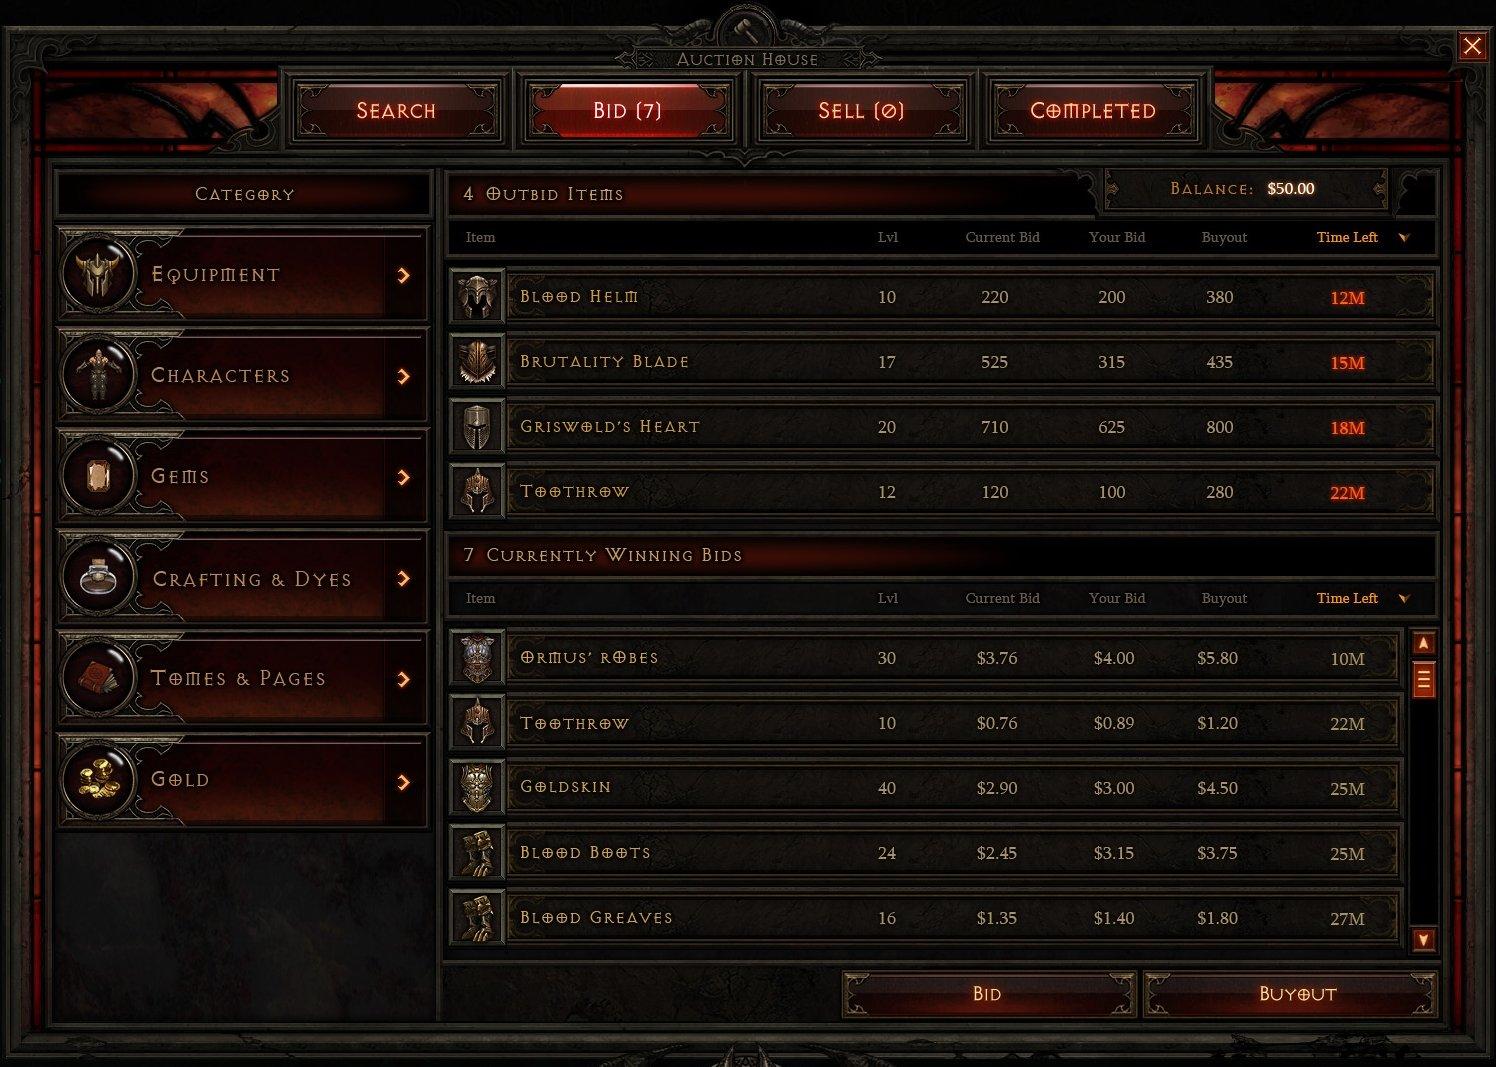 Diablo 3: Auktionshaus